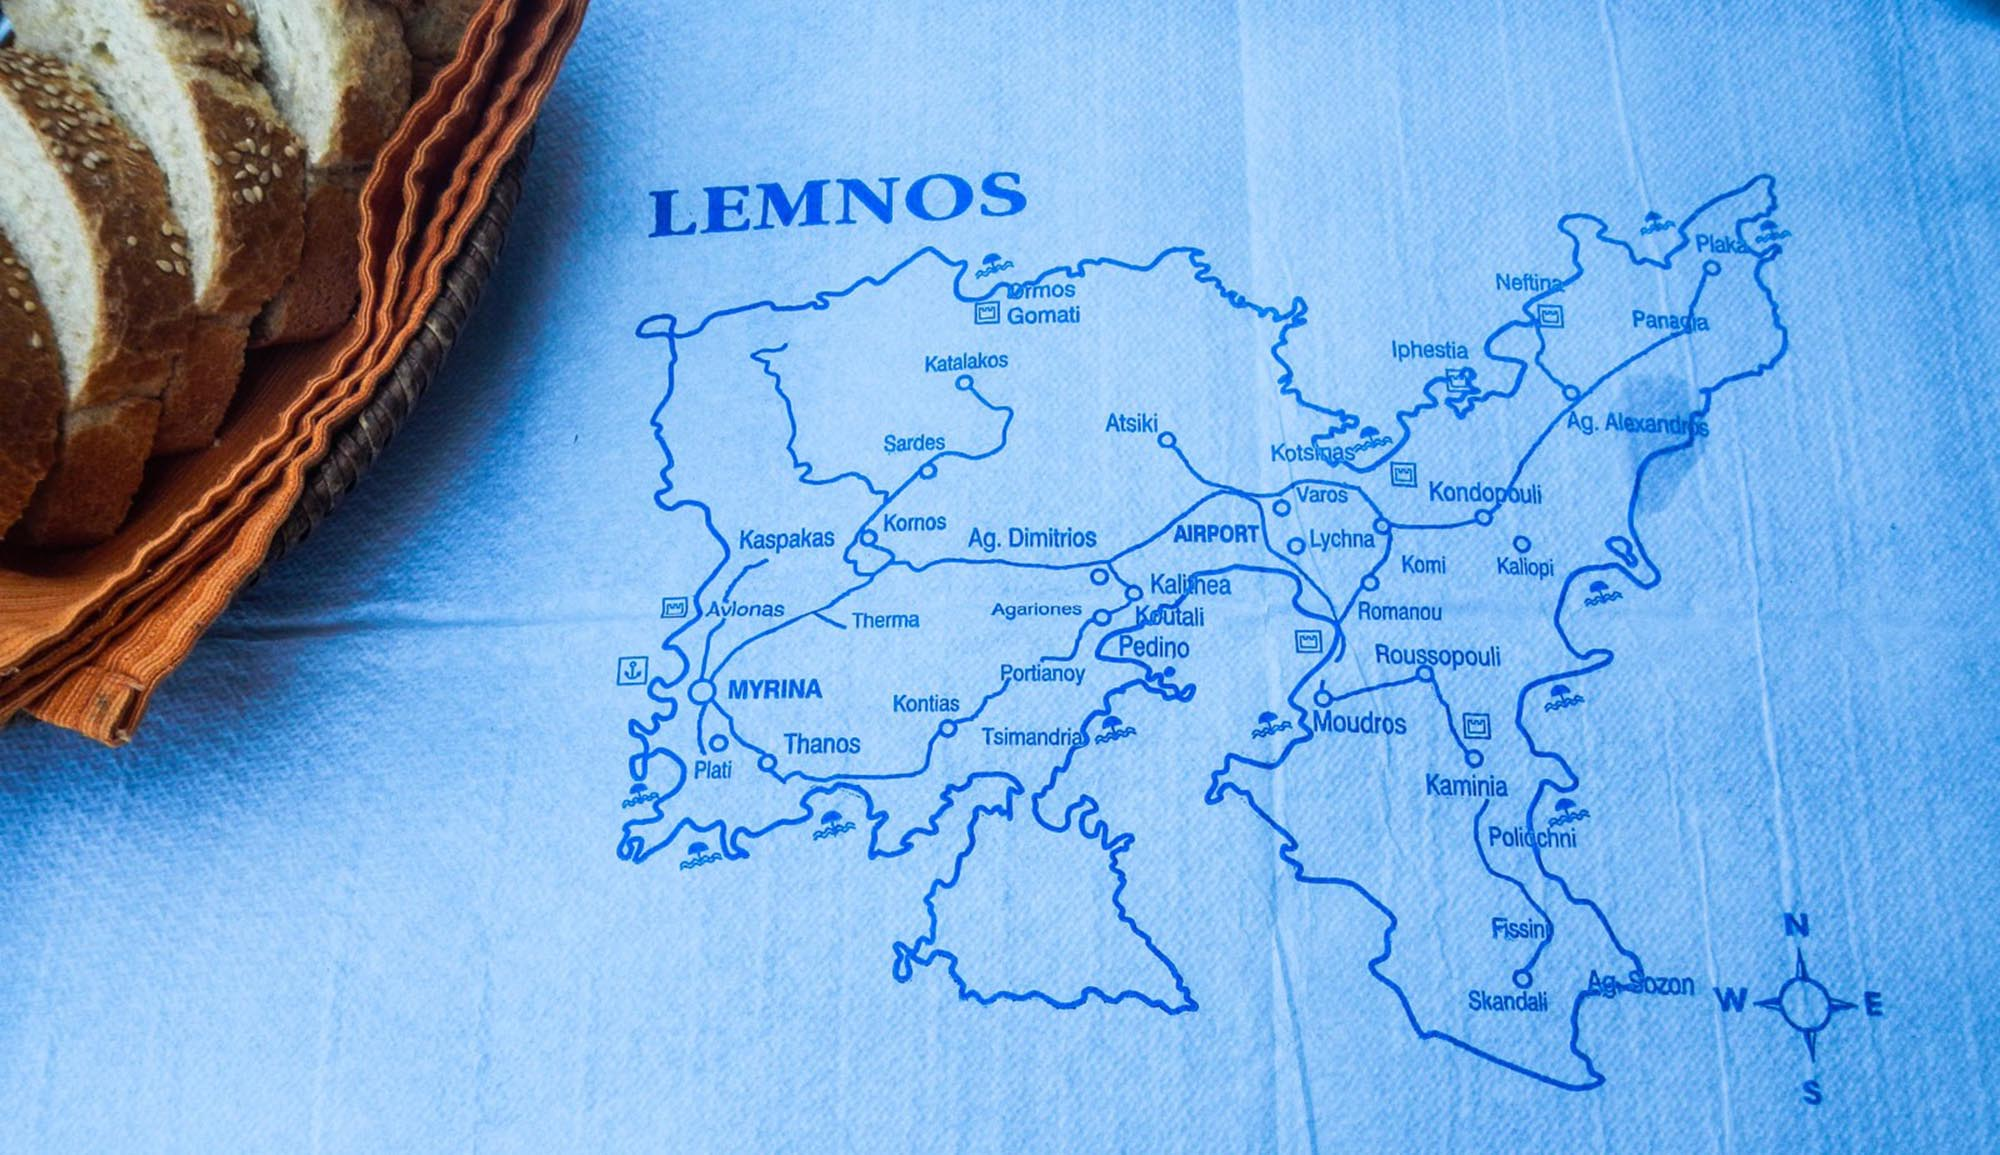 ! 2034-lemnos-island-ile